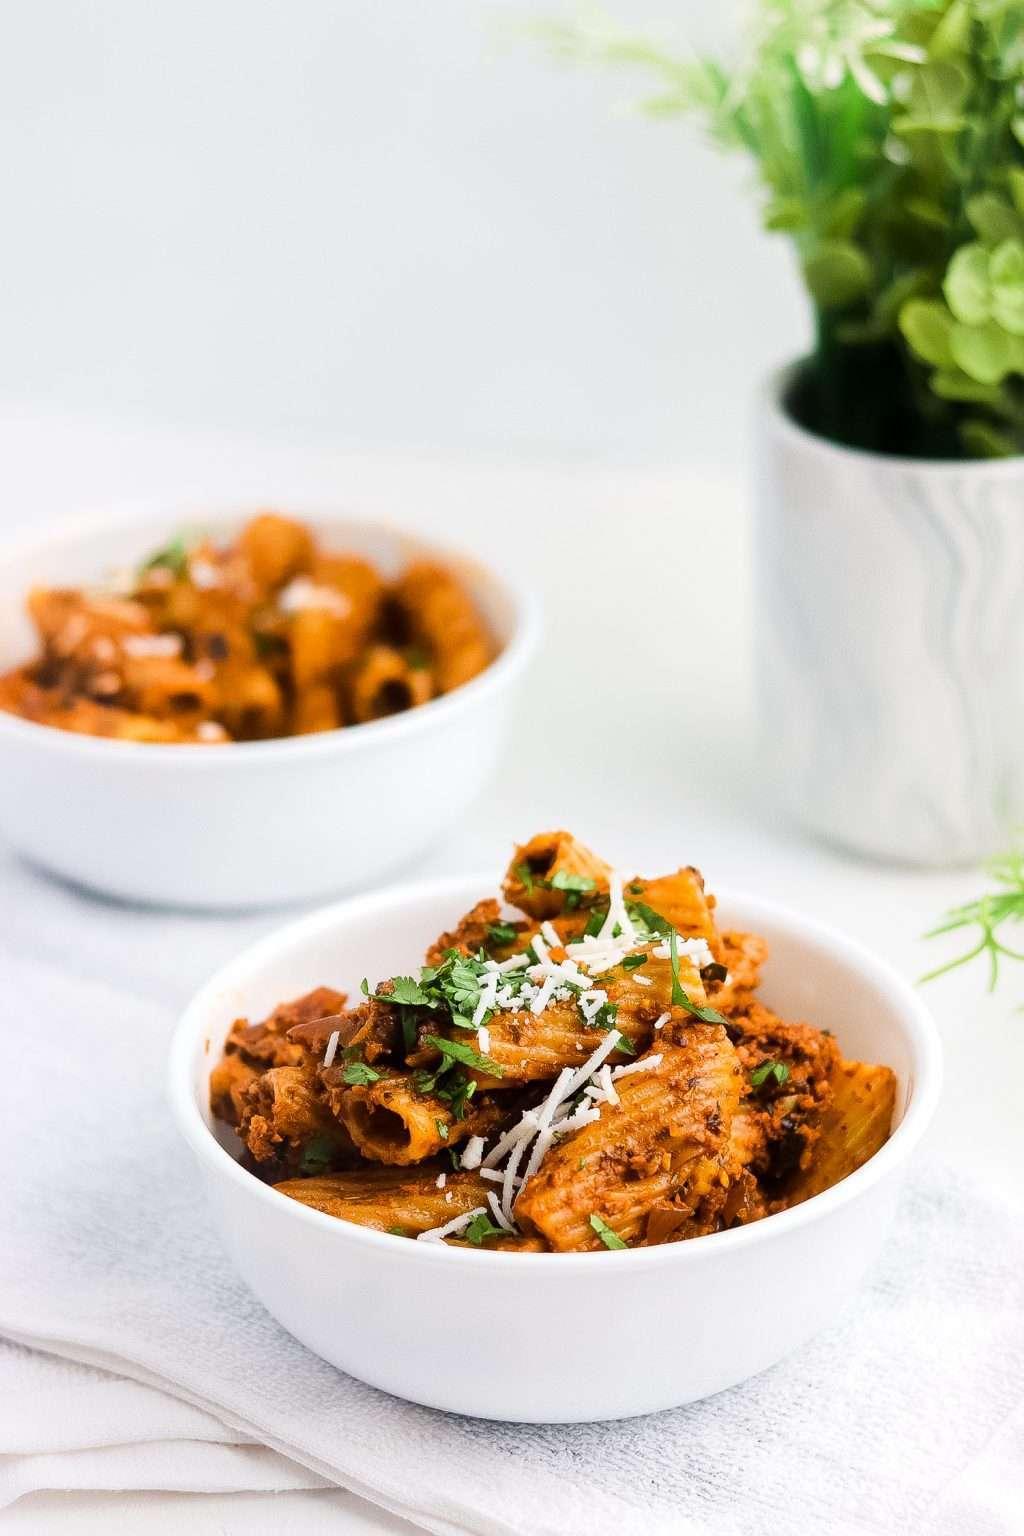 Vegan Bolognese Recipe 6061 1024x1536 - Vegan Bolognese Recipe | Meatless Rigatoni Plant-Based Dish